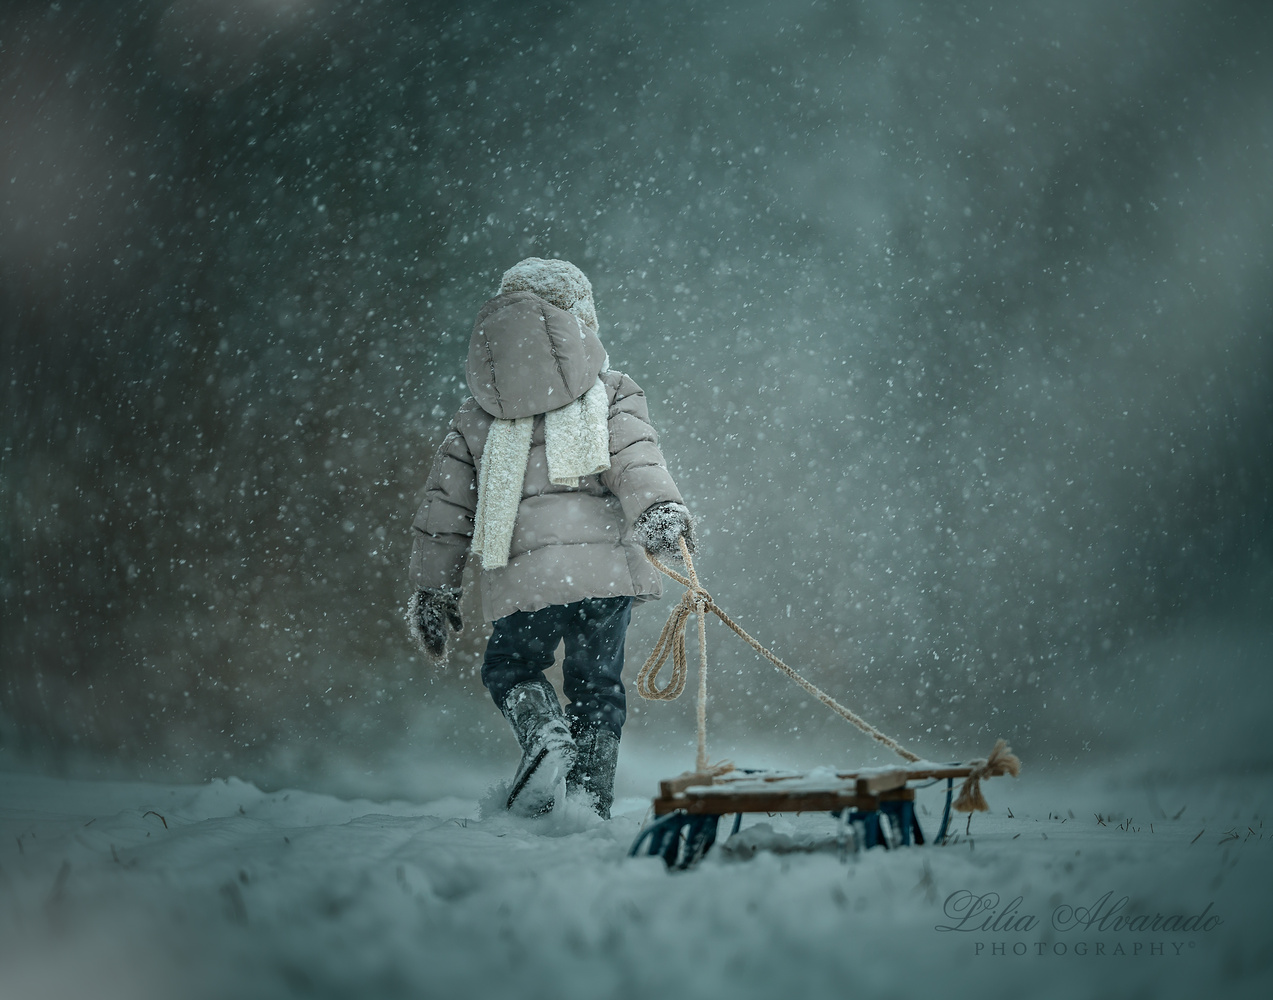 Into the blizzard.. by Lilia Alvarado